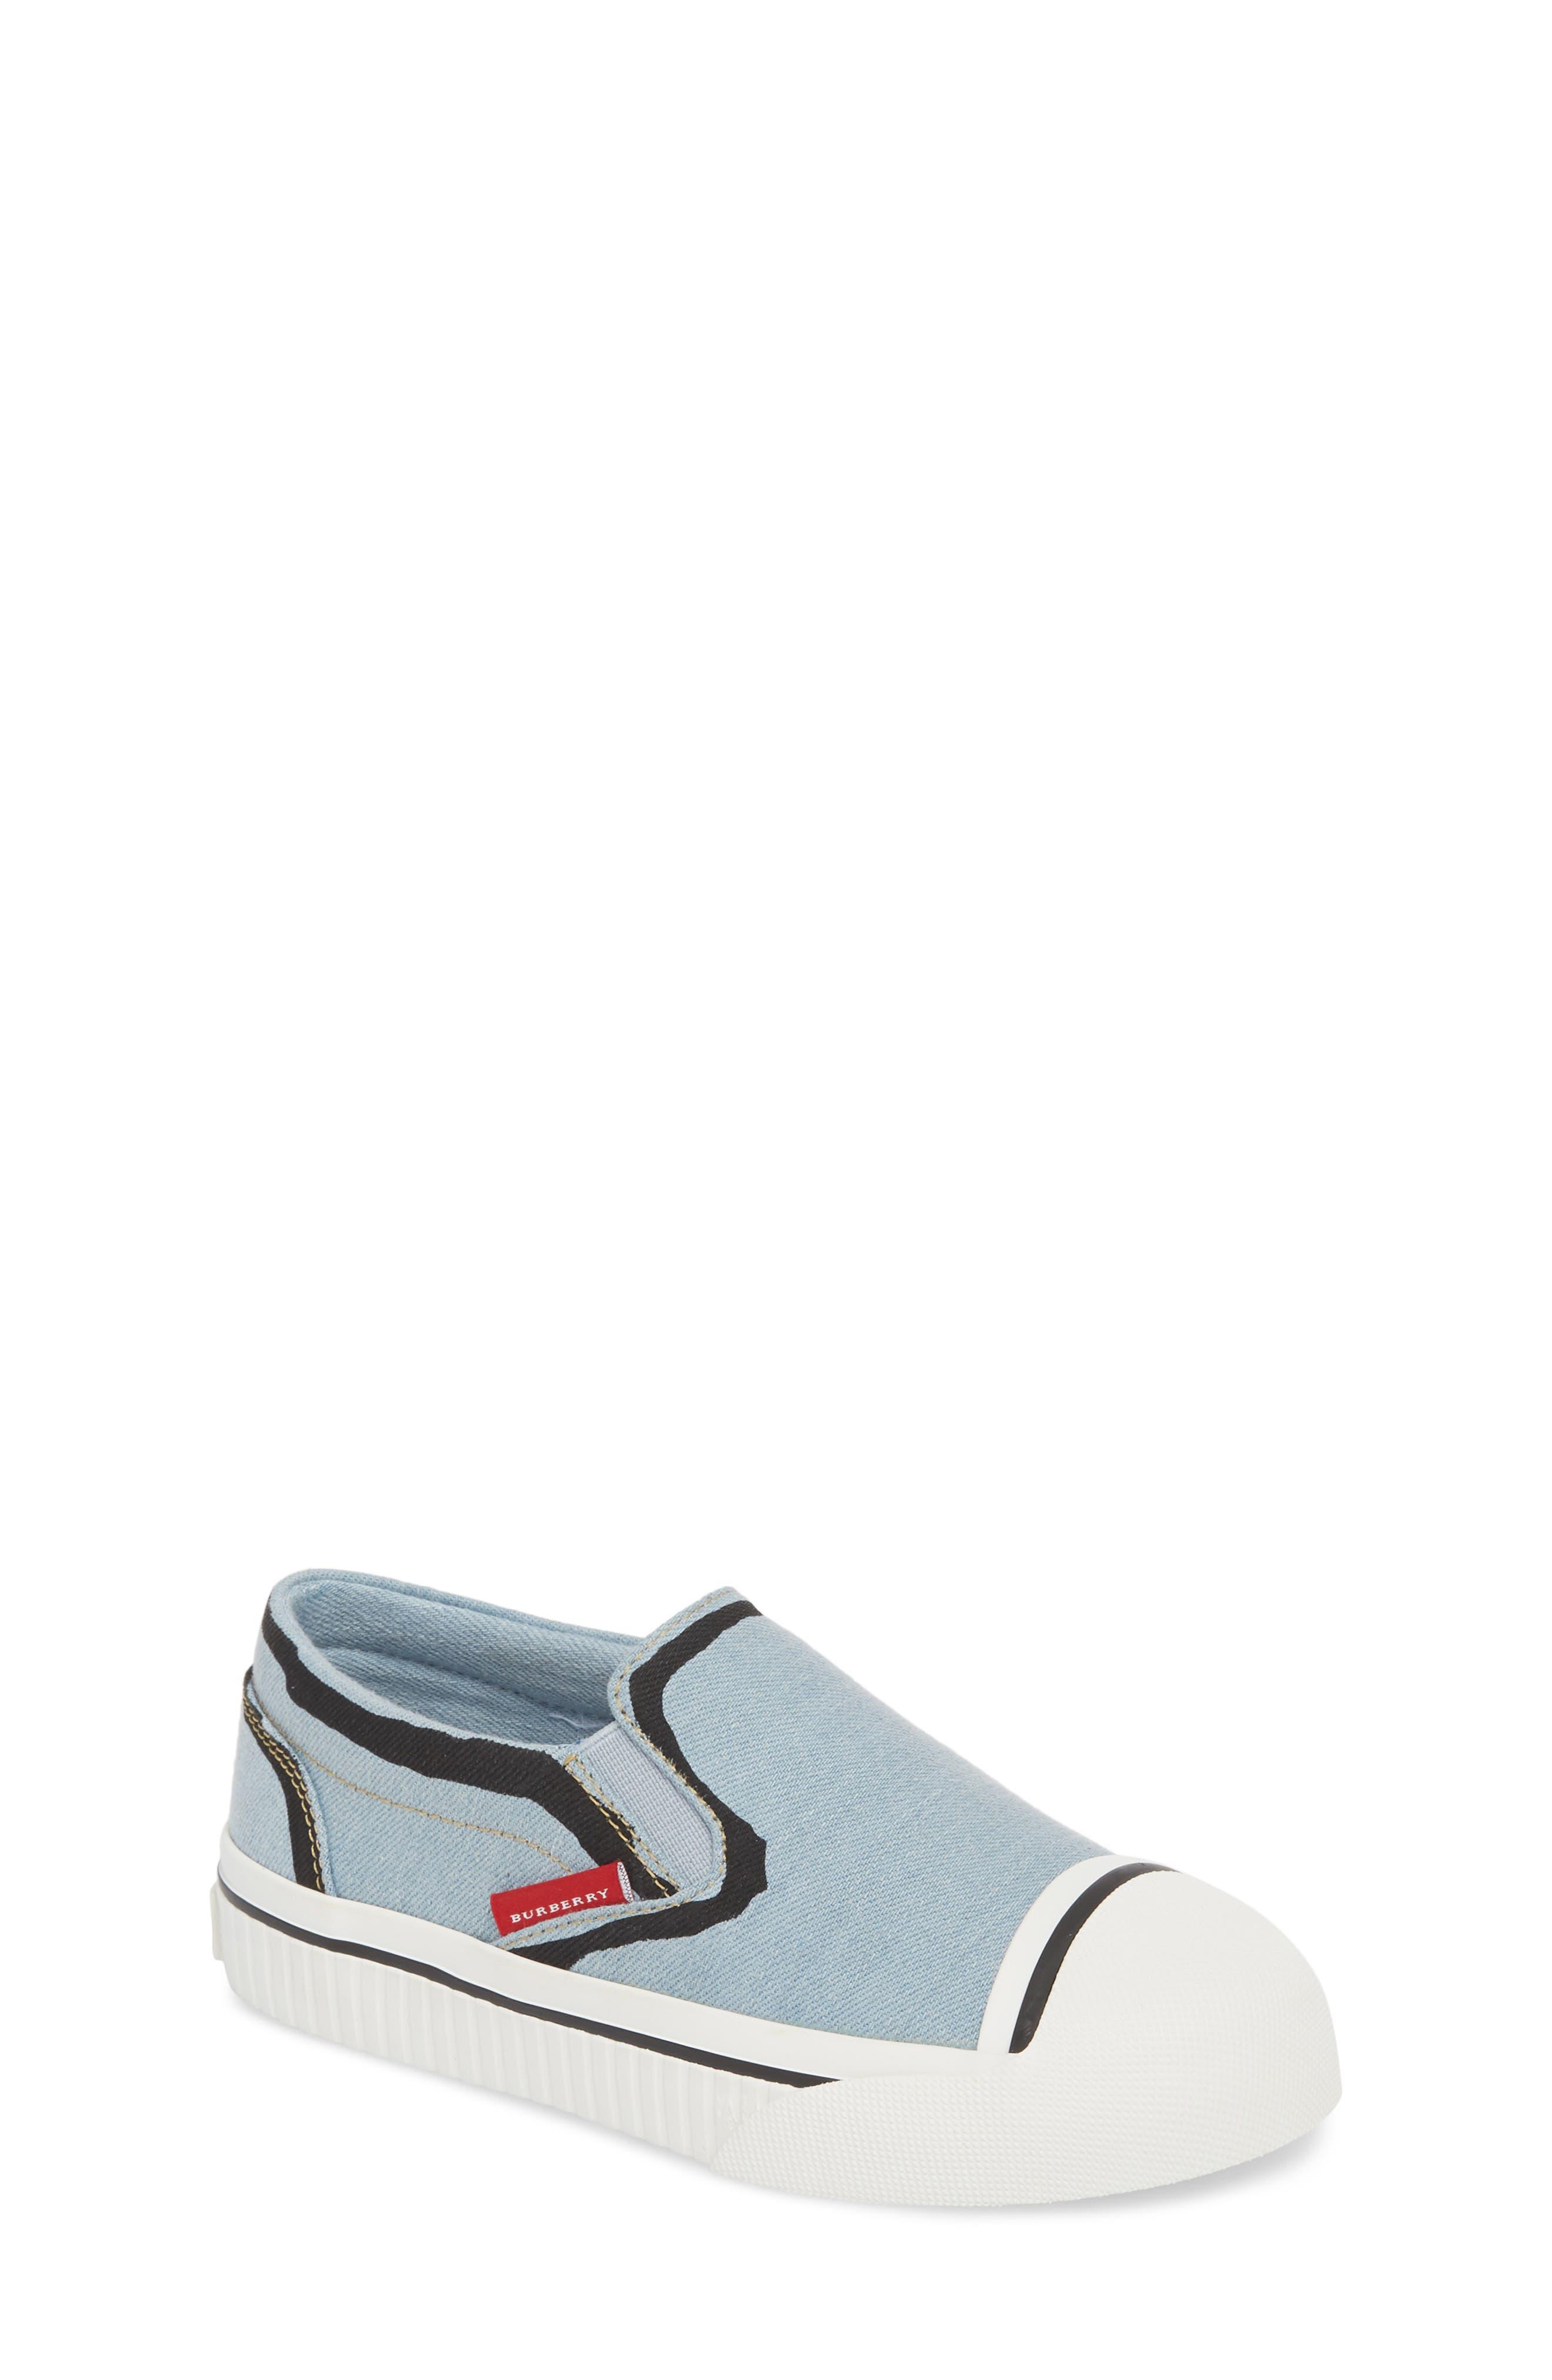 Lipton Slip-On Sneaker,                             Main thumbnail 1, color,                             LIGHT BLUE